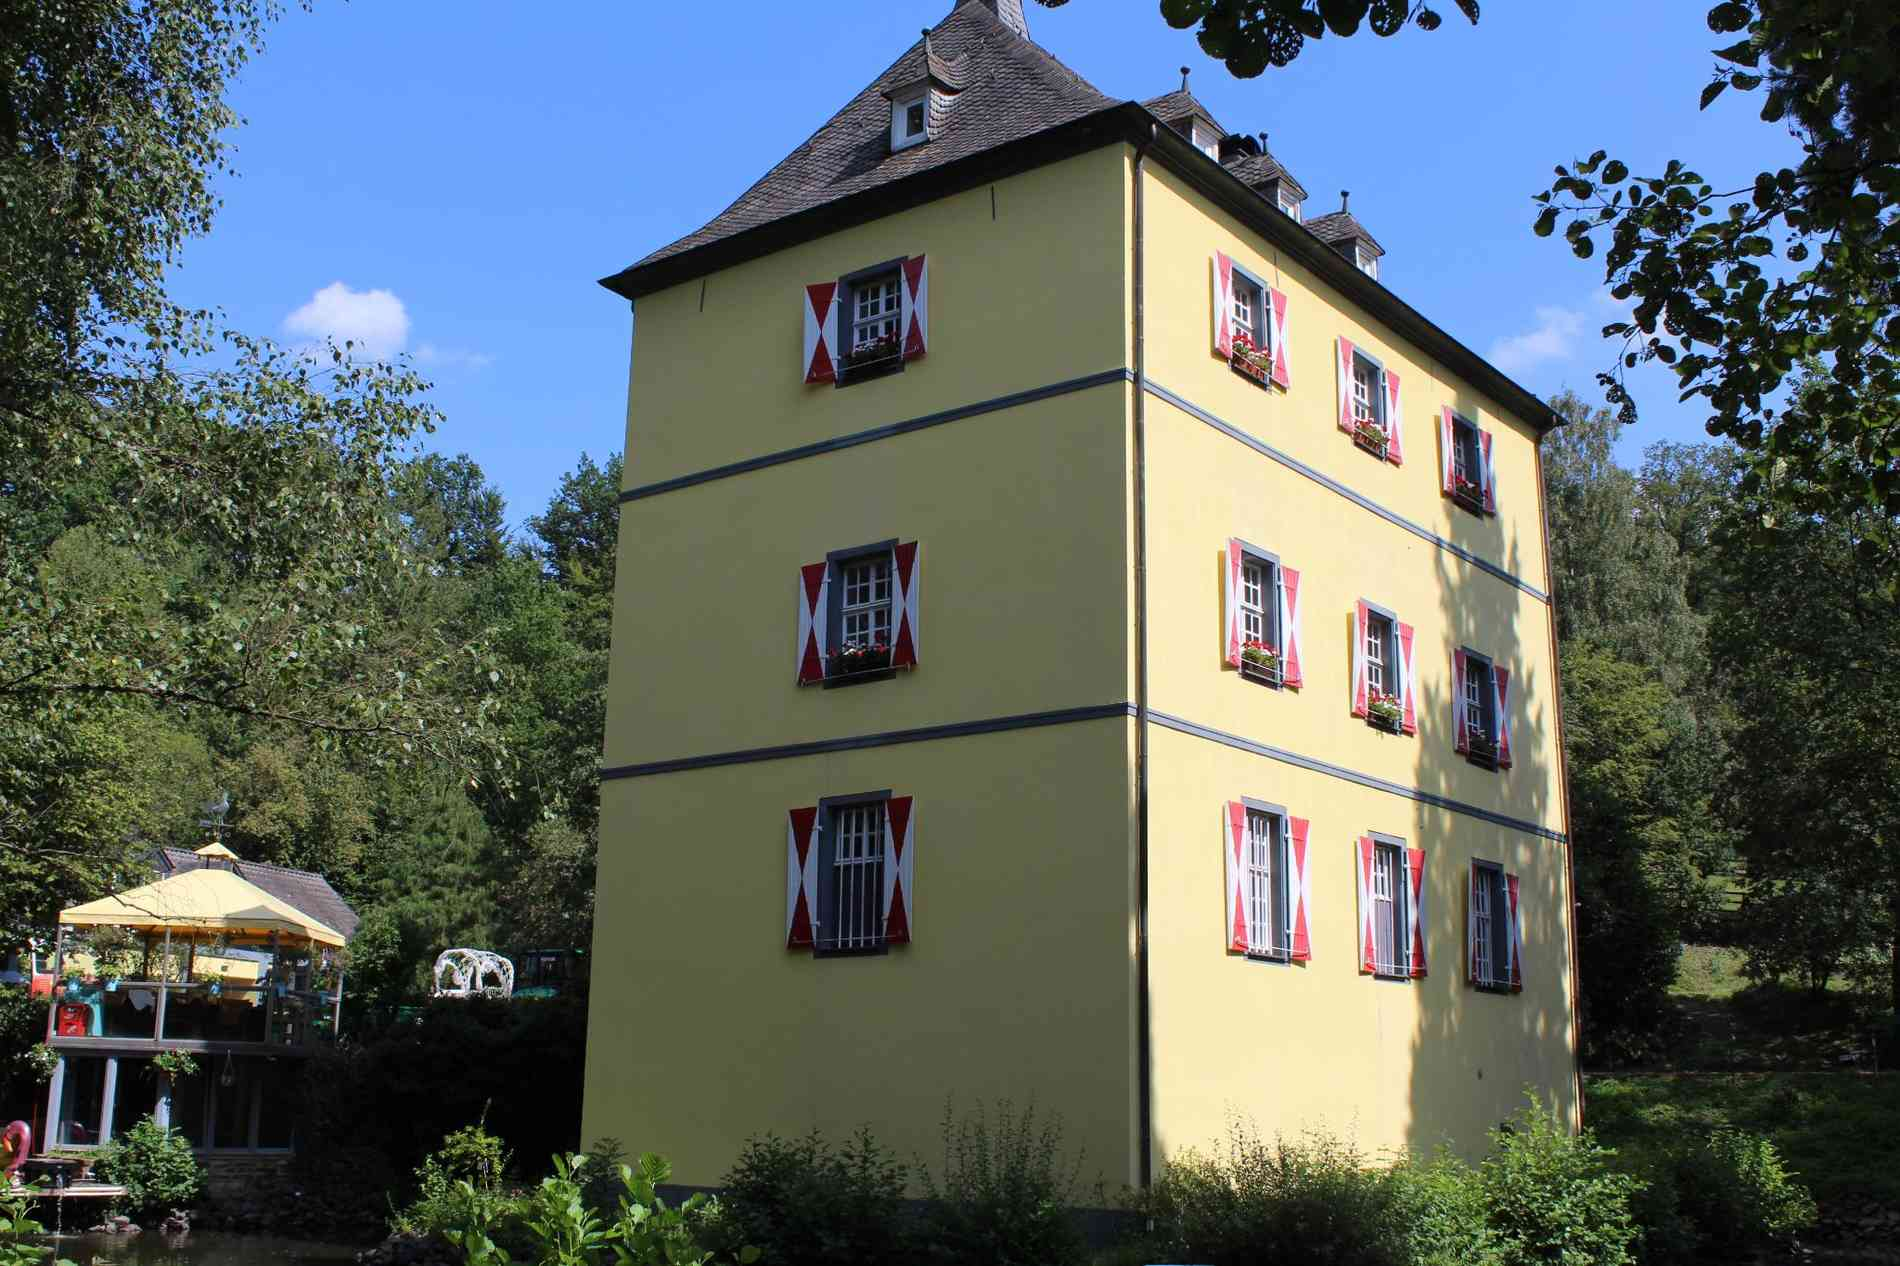 Burg Welterode